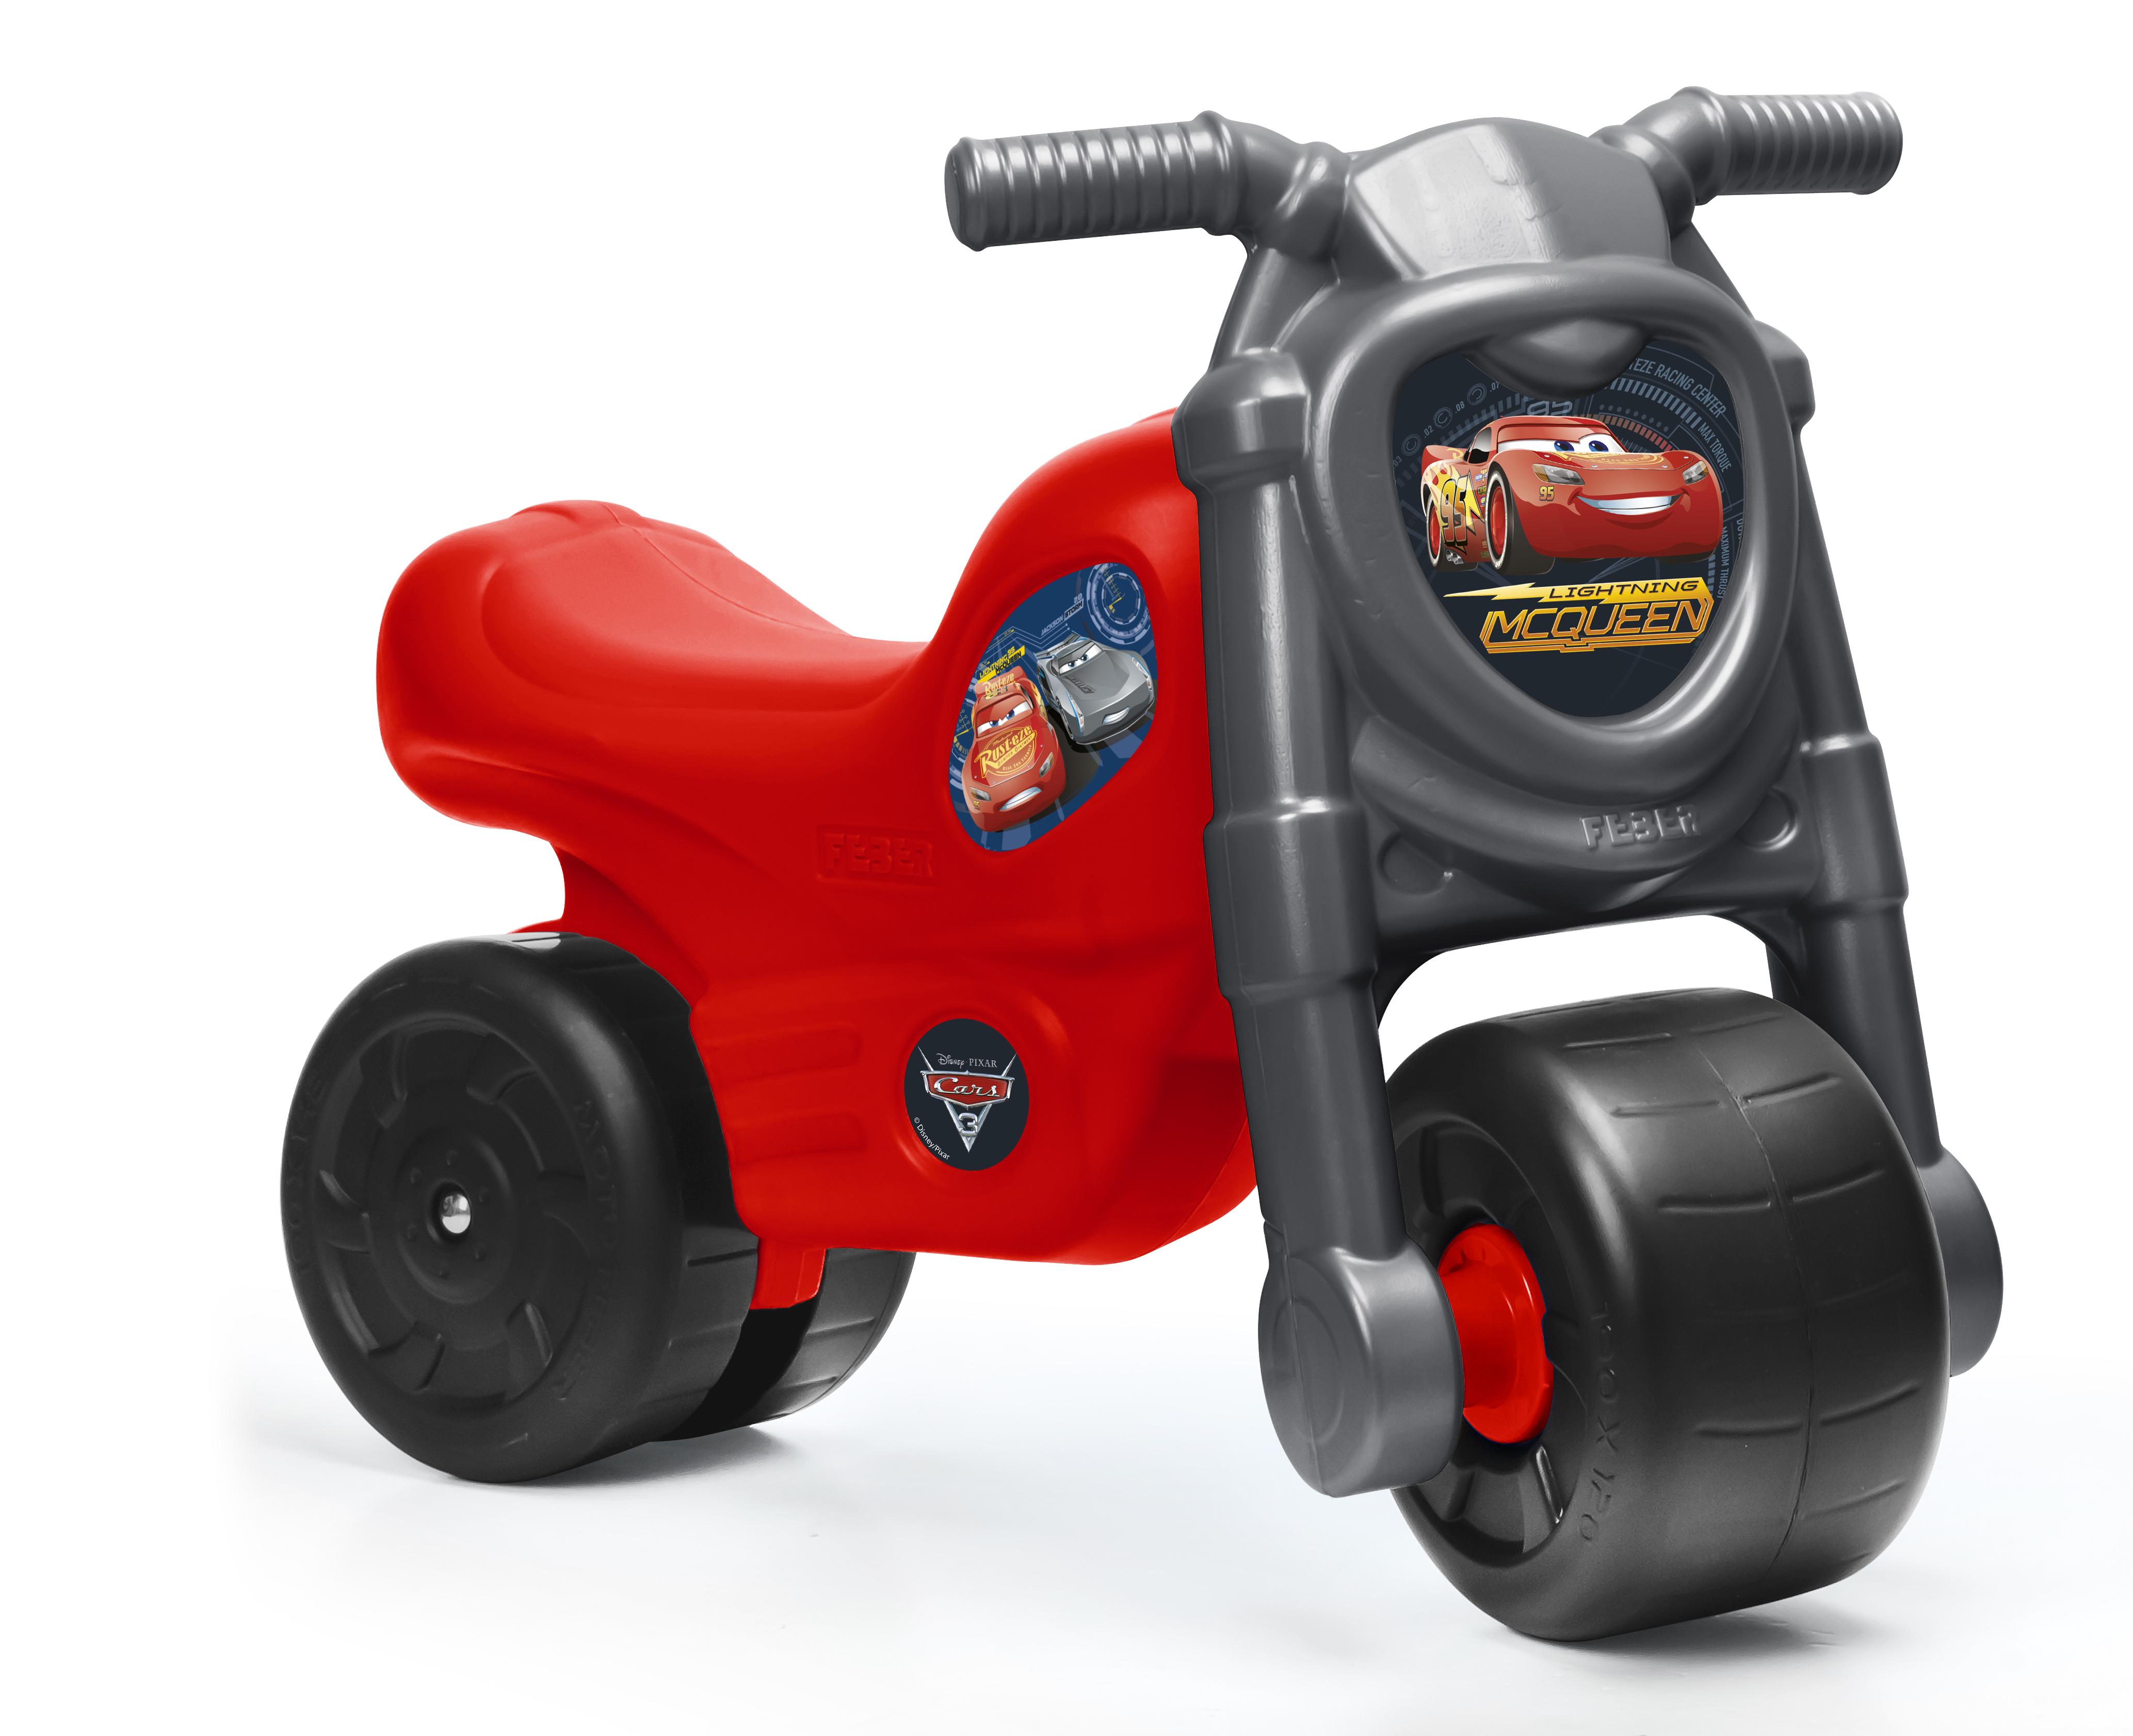 Porteur 800011142 Jumper Cars Motofeber 3 Moto KTlFc1J